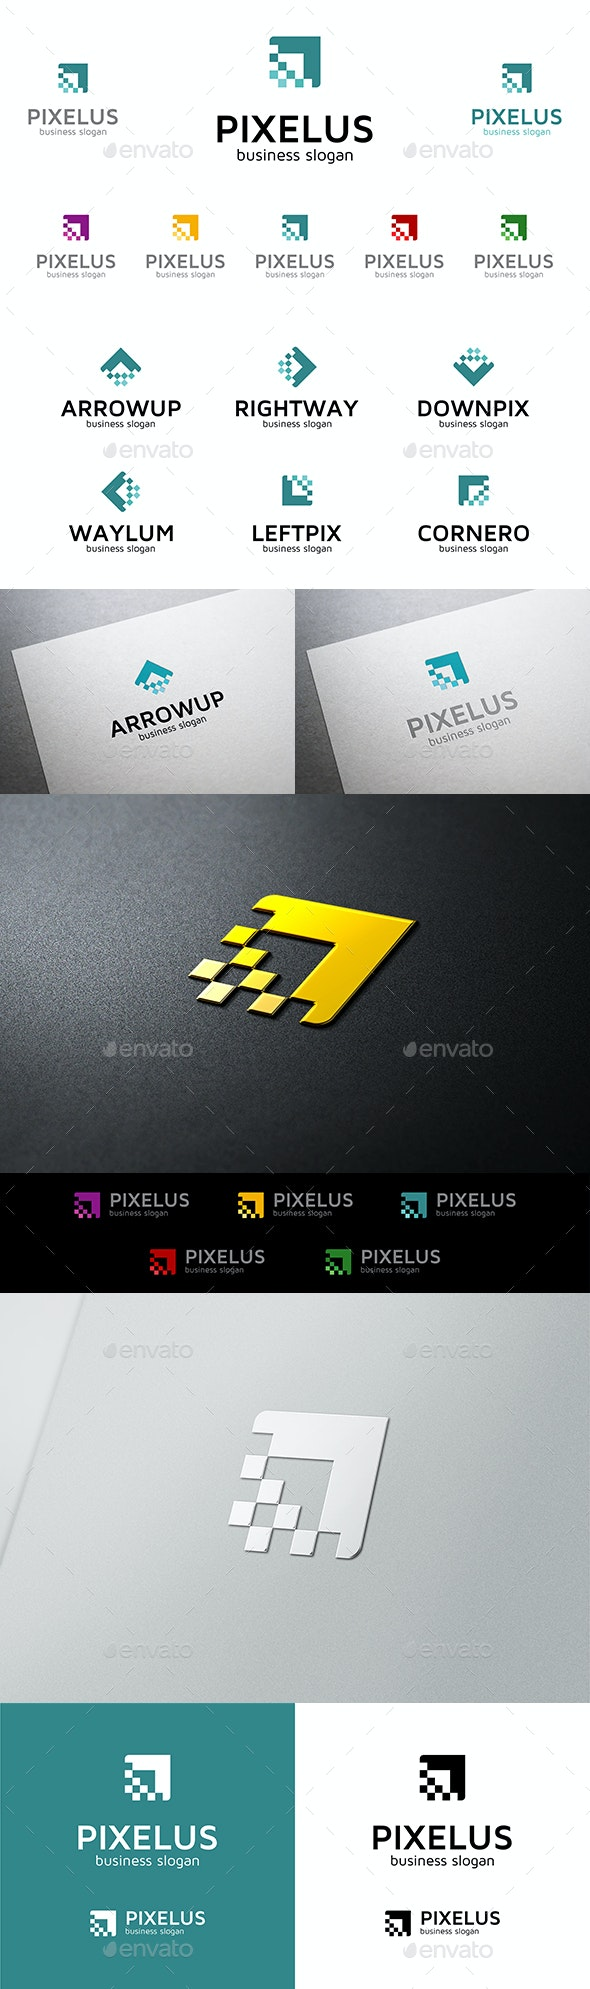 Pixelus Pixel Arrow Vector Multipurpose Logo Template for Business - Vector Abstract